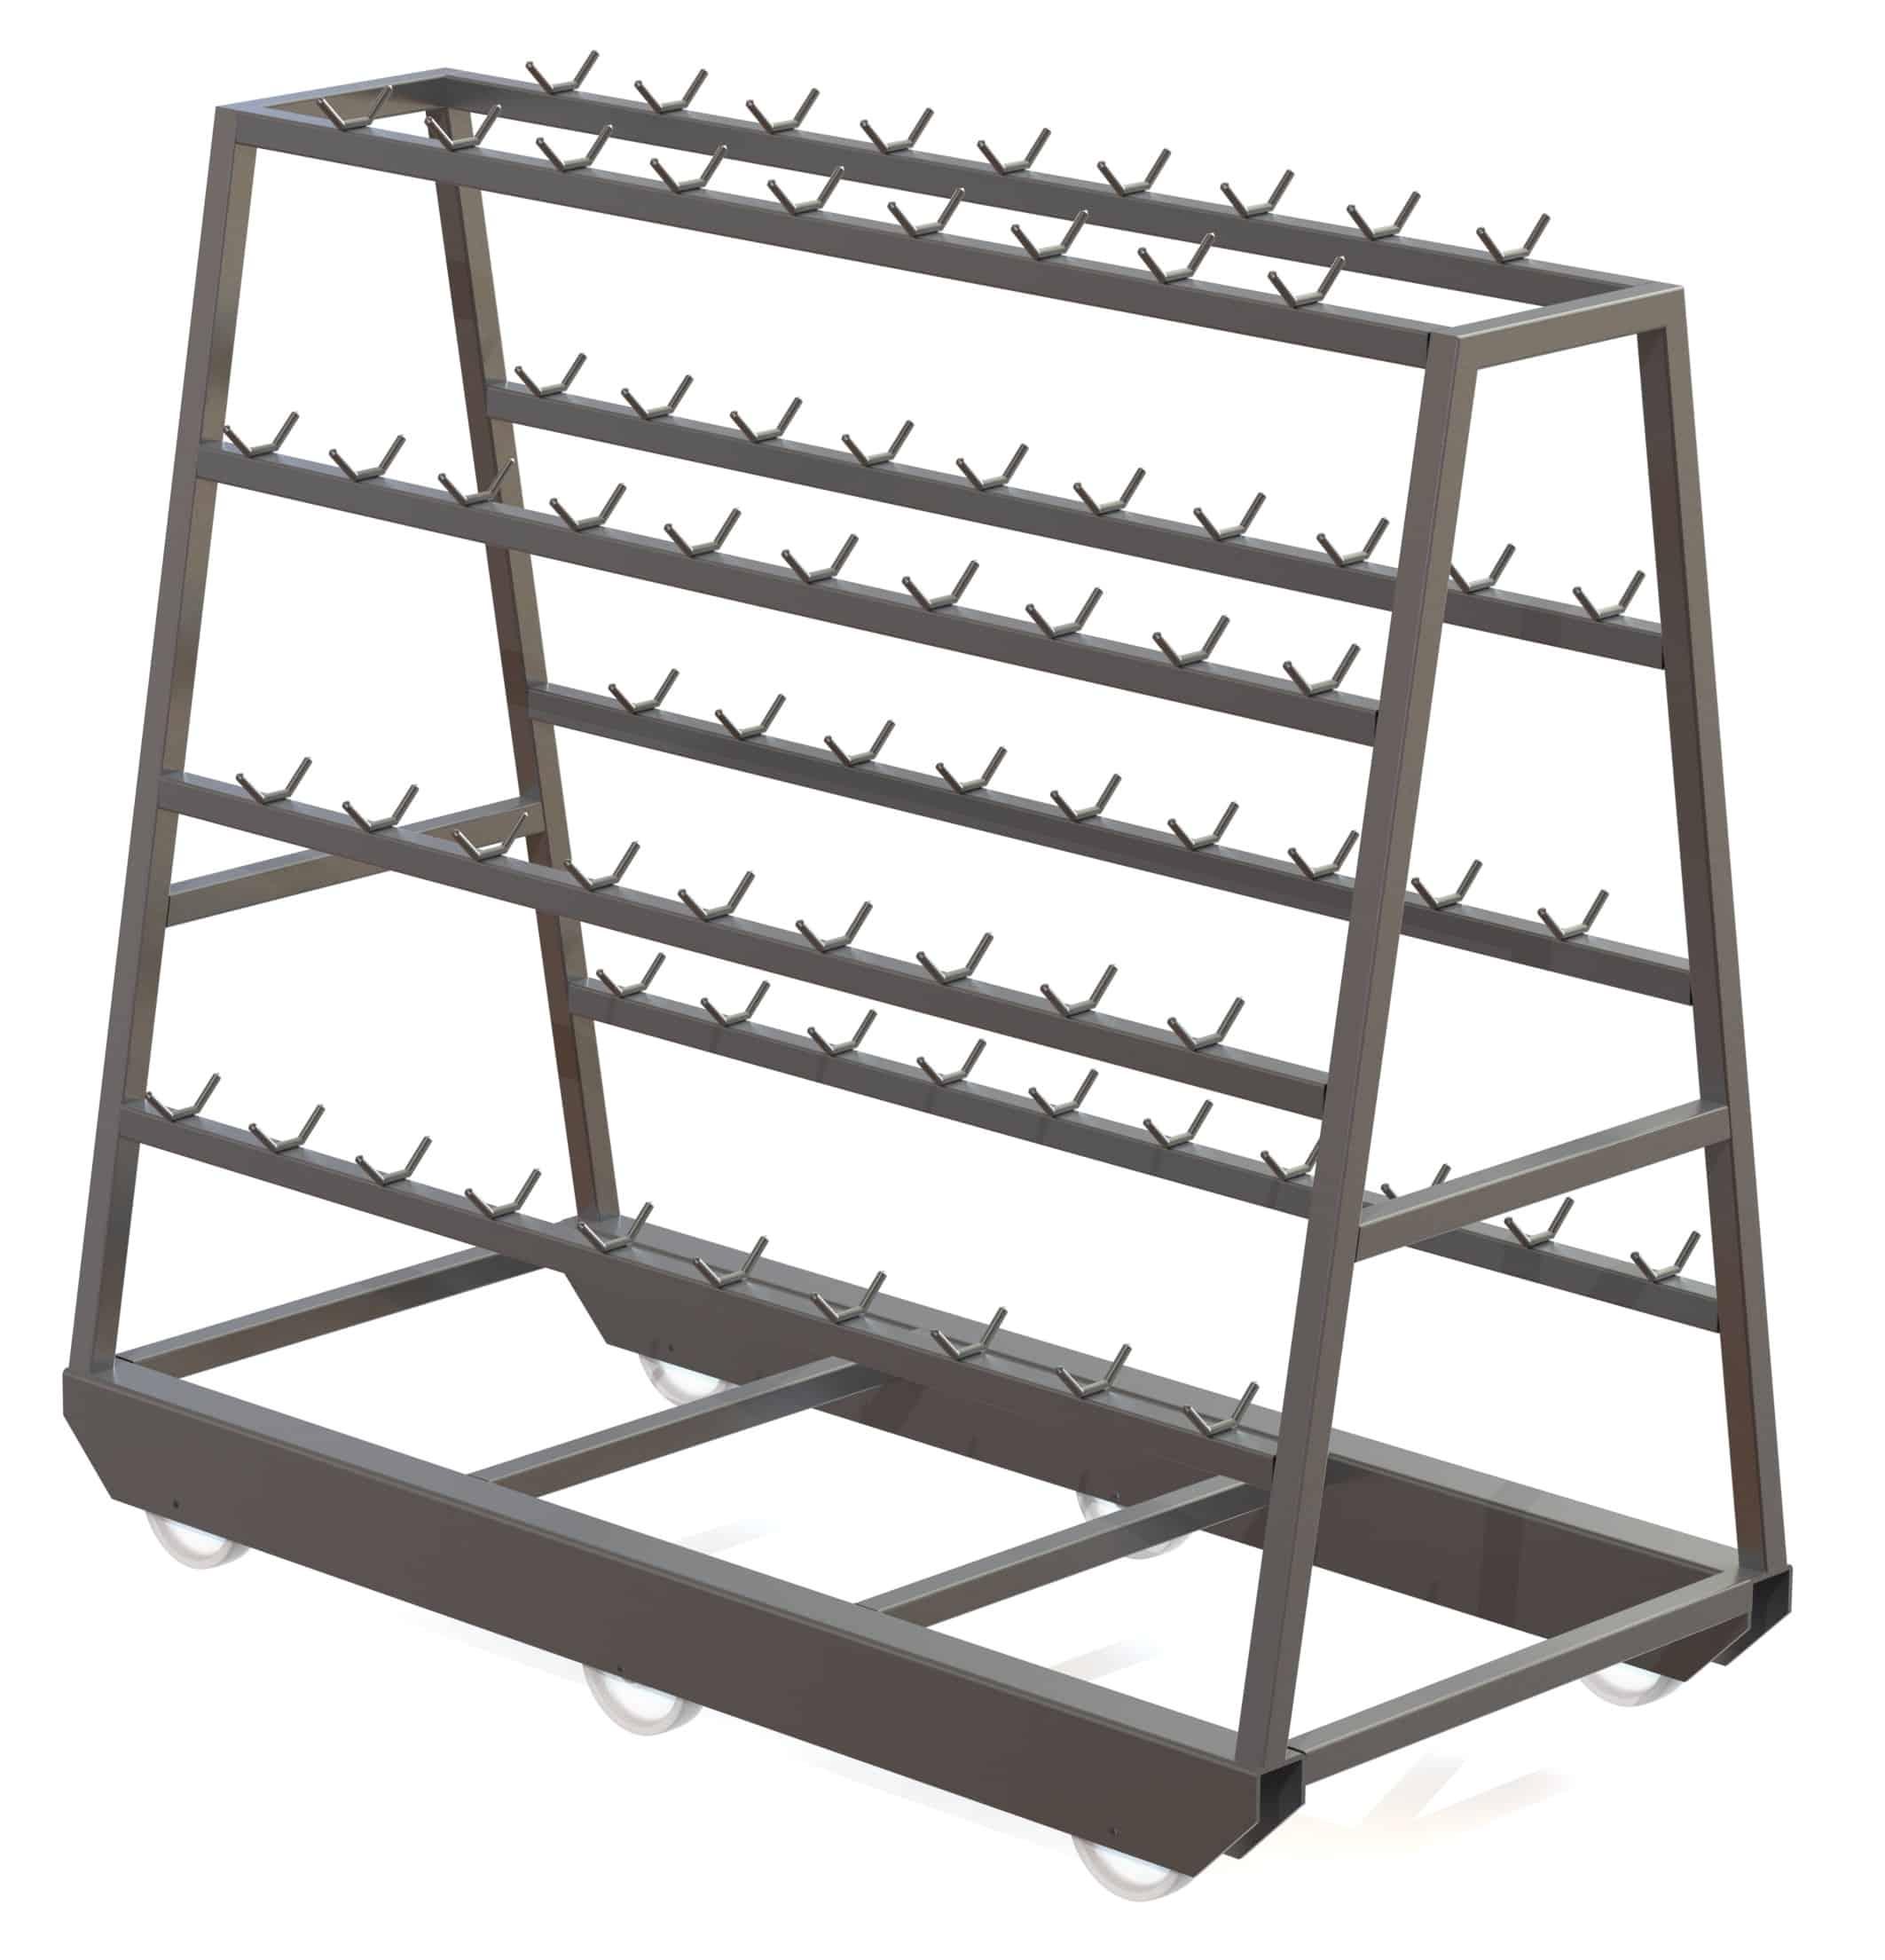 Offal Rack